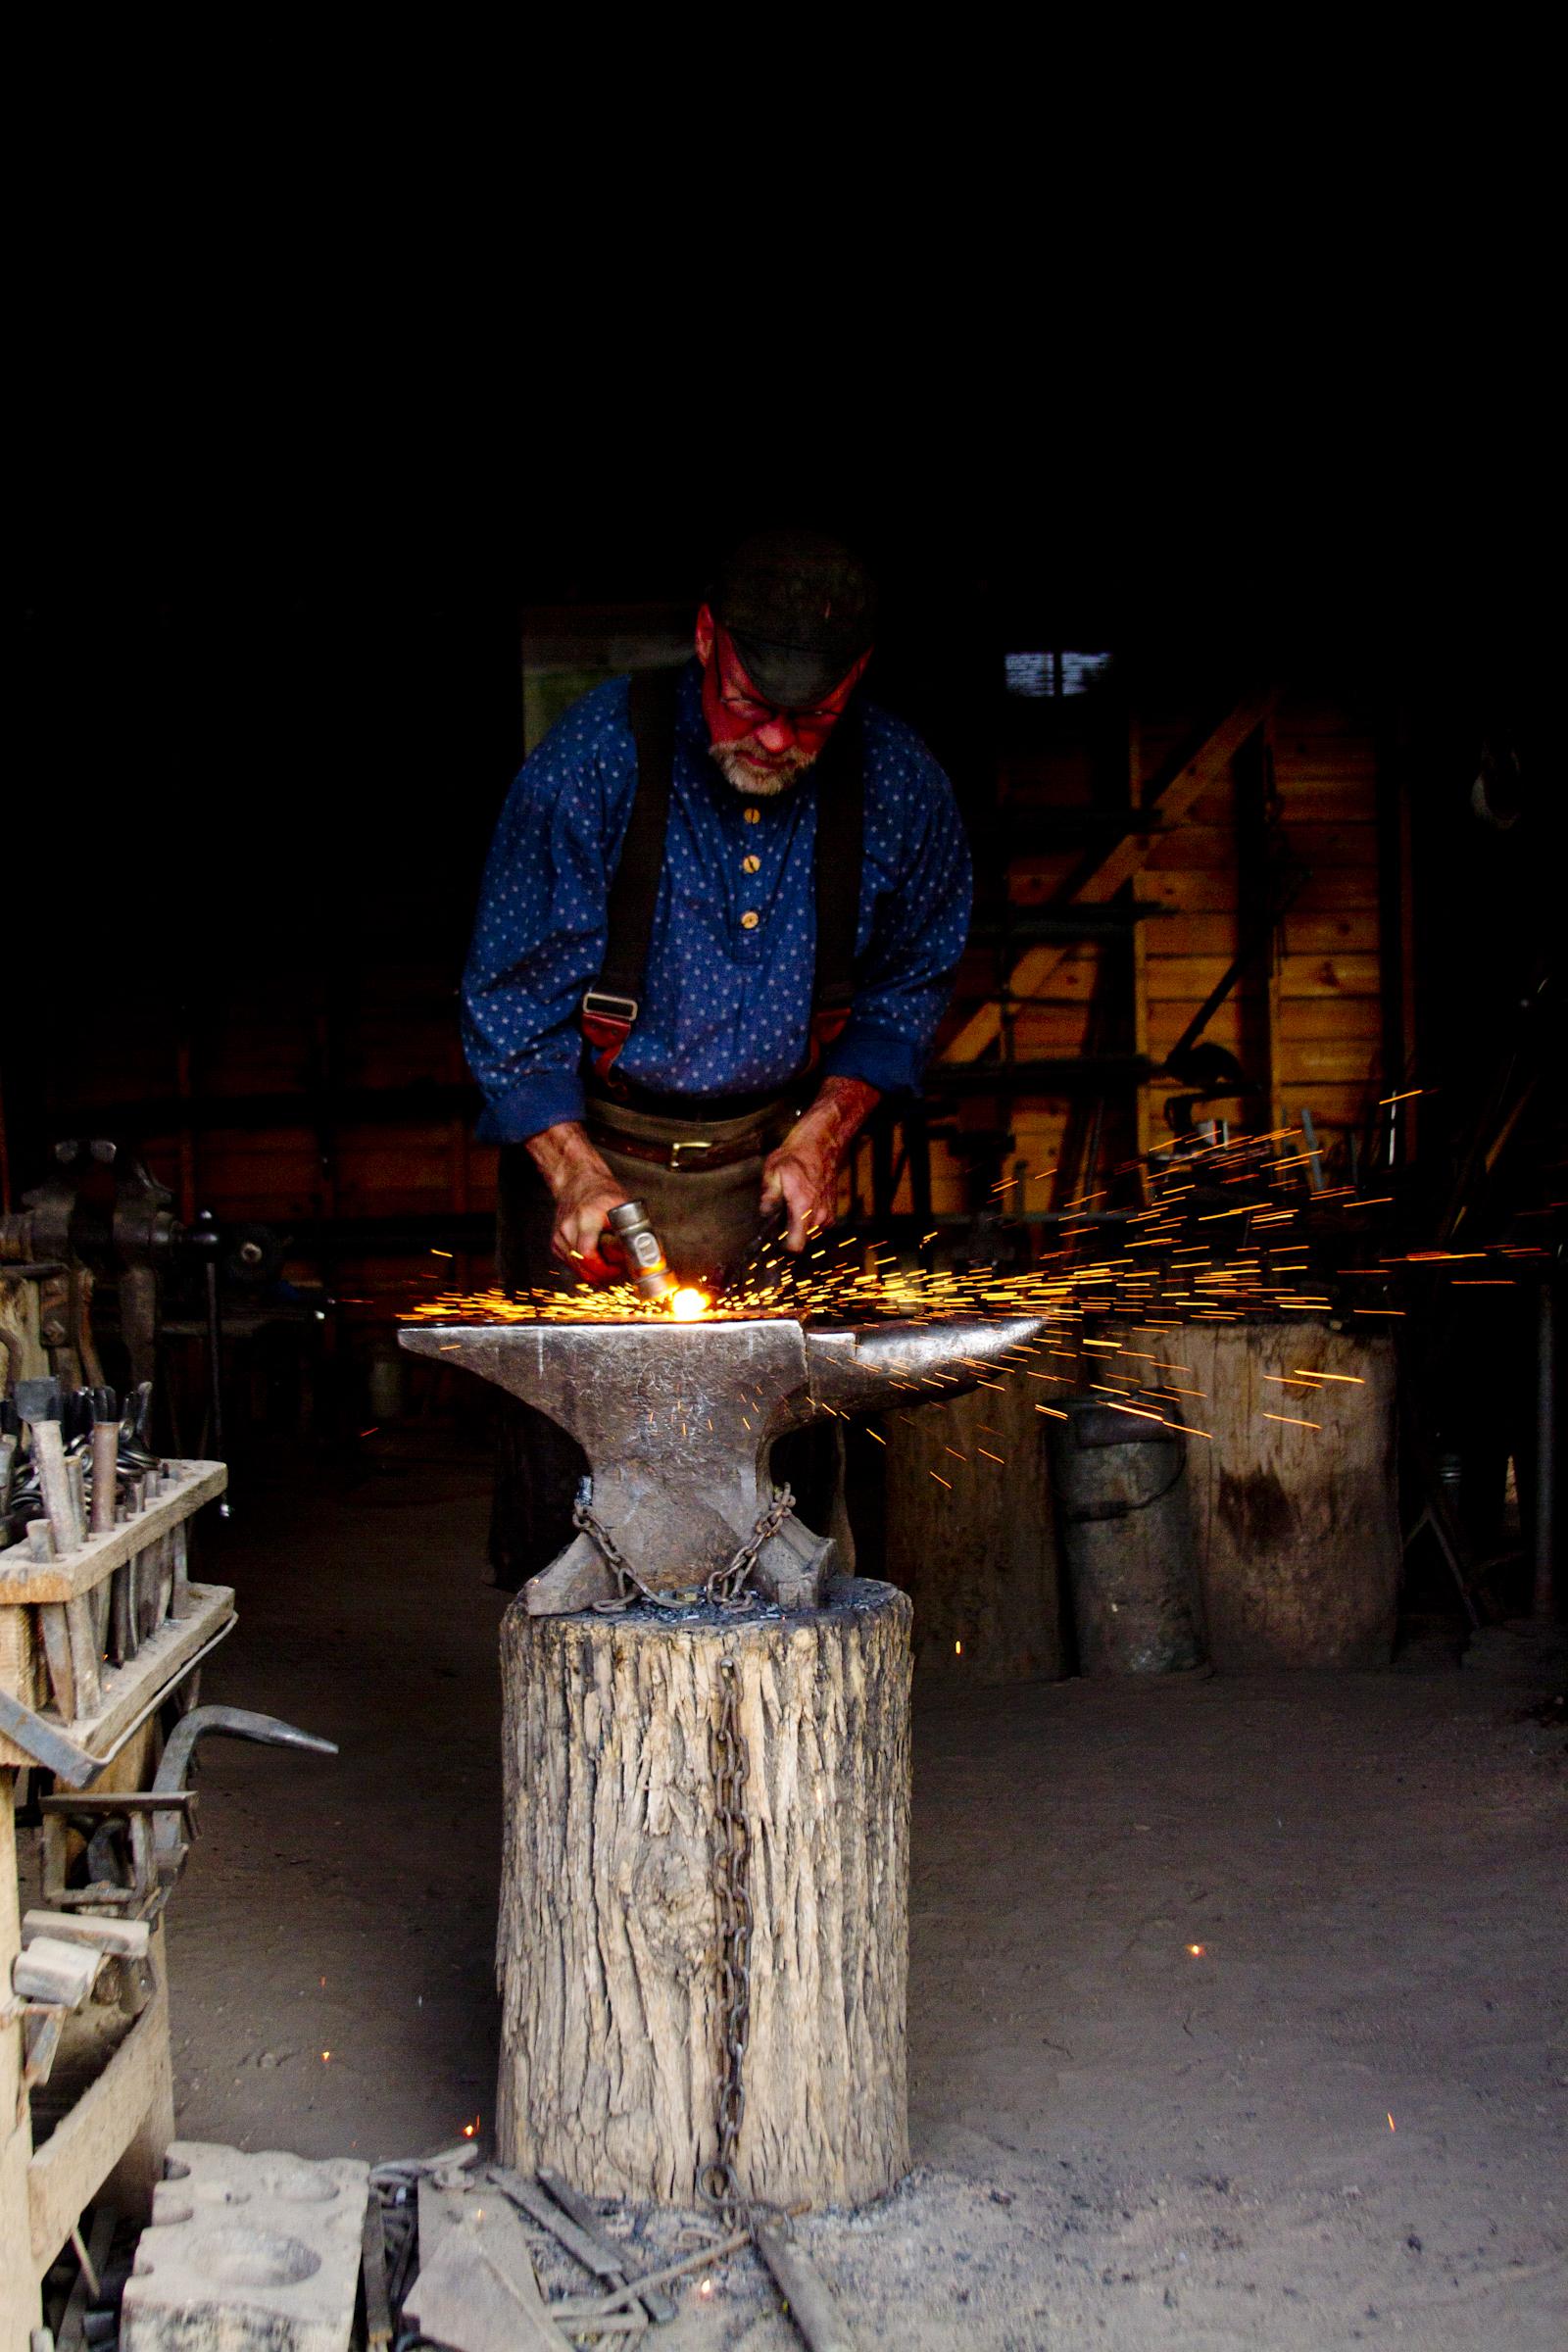 Blacksmith working iron in his shop